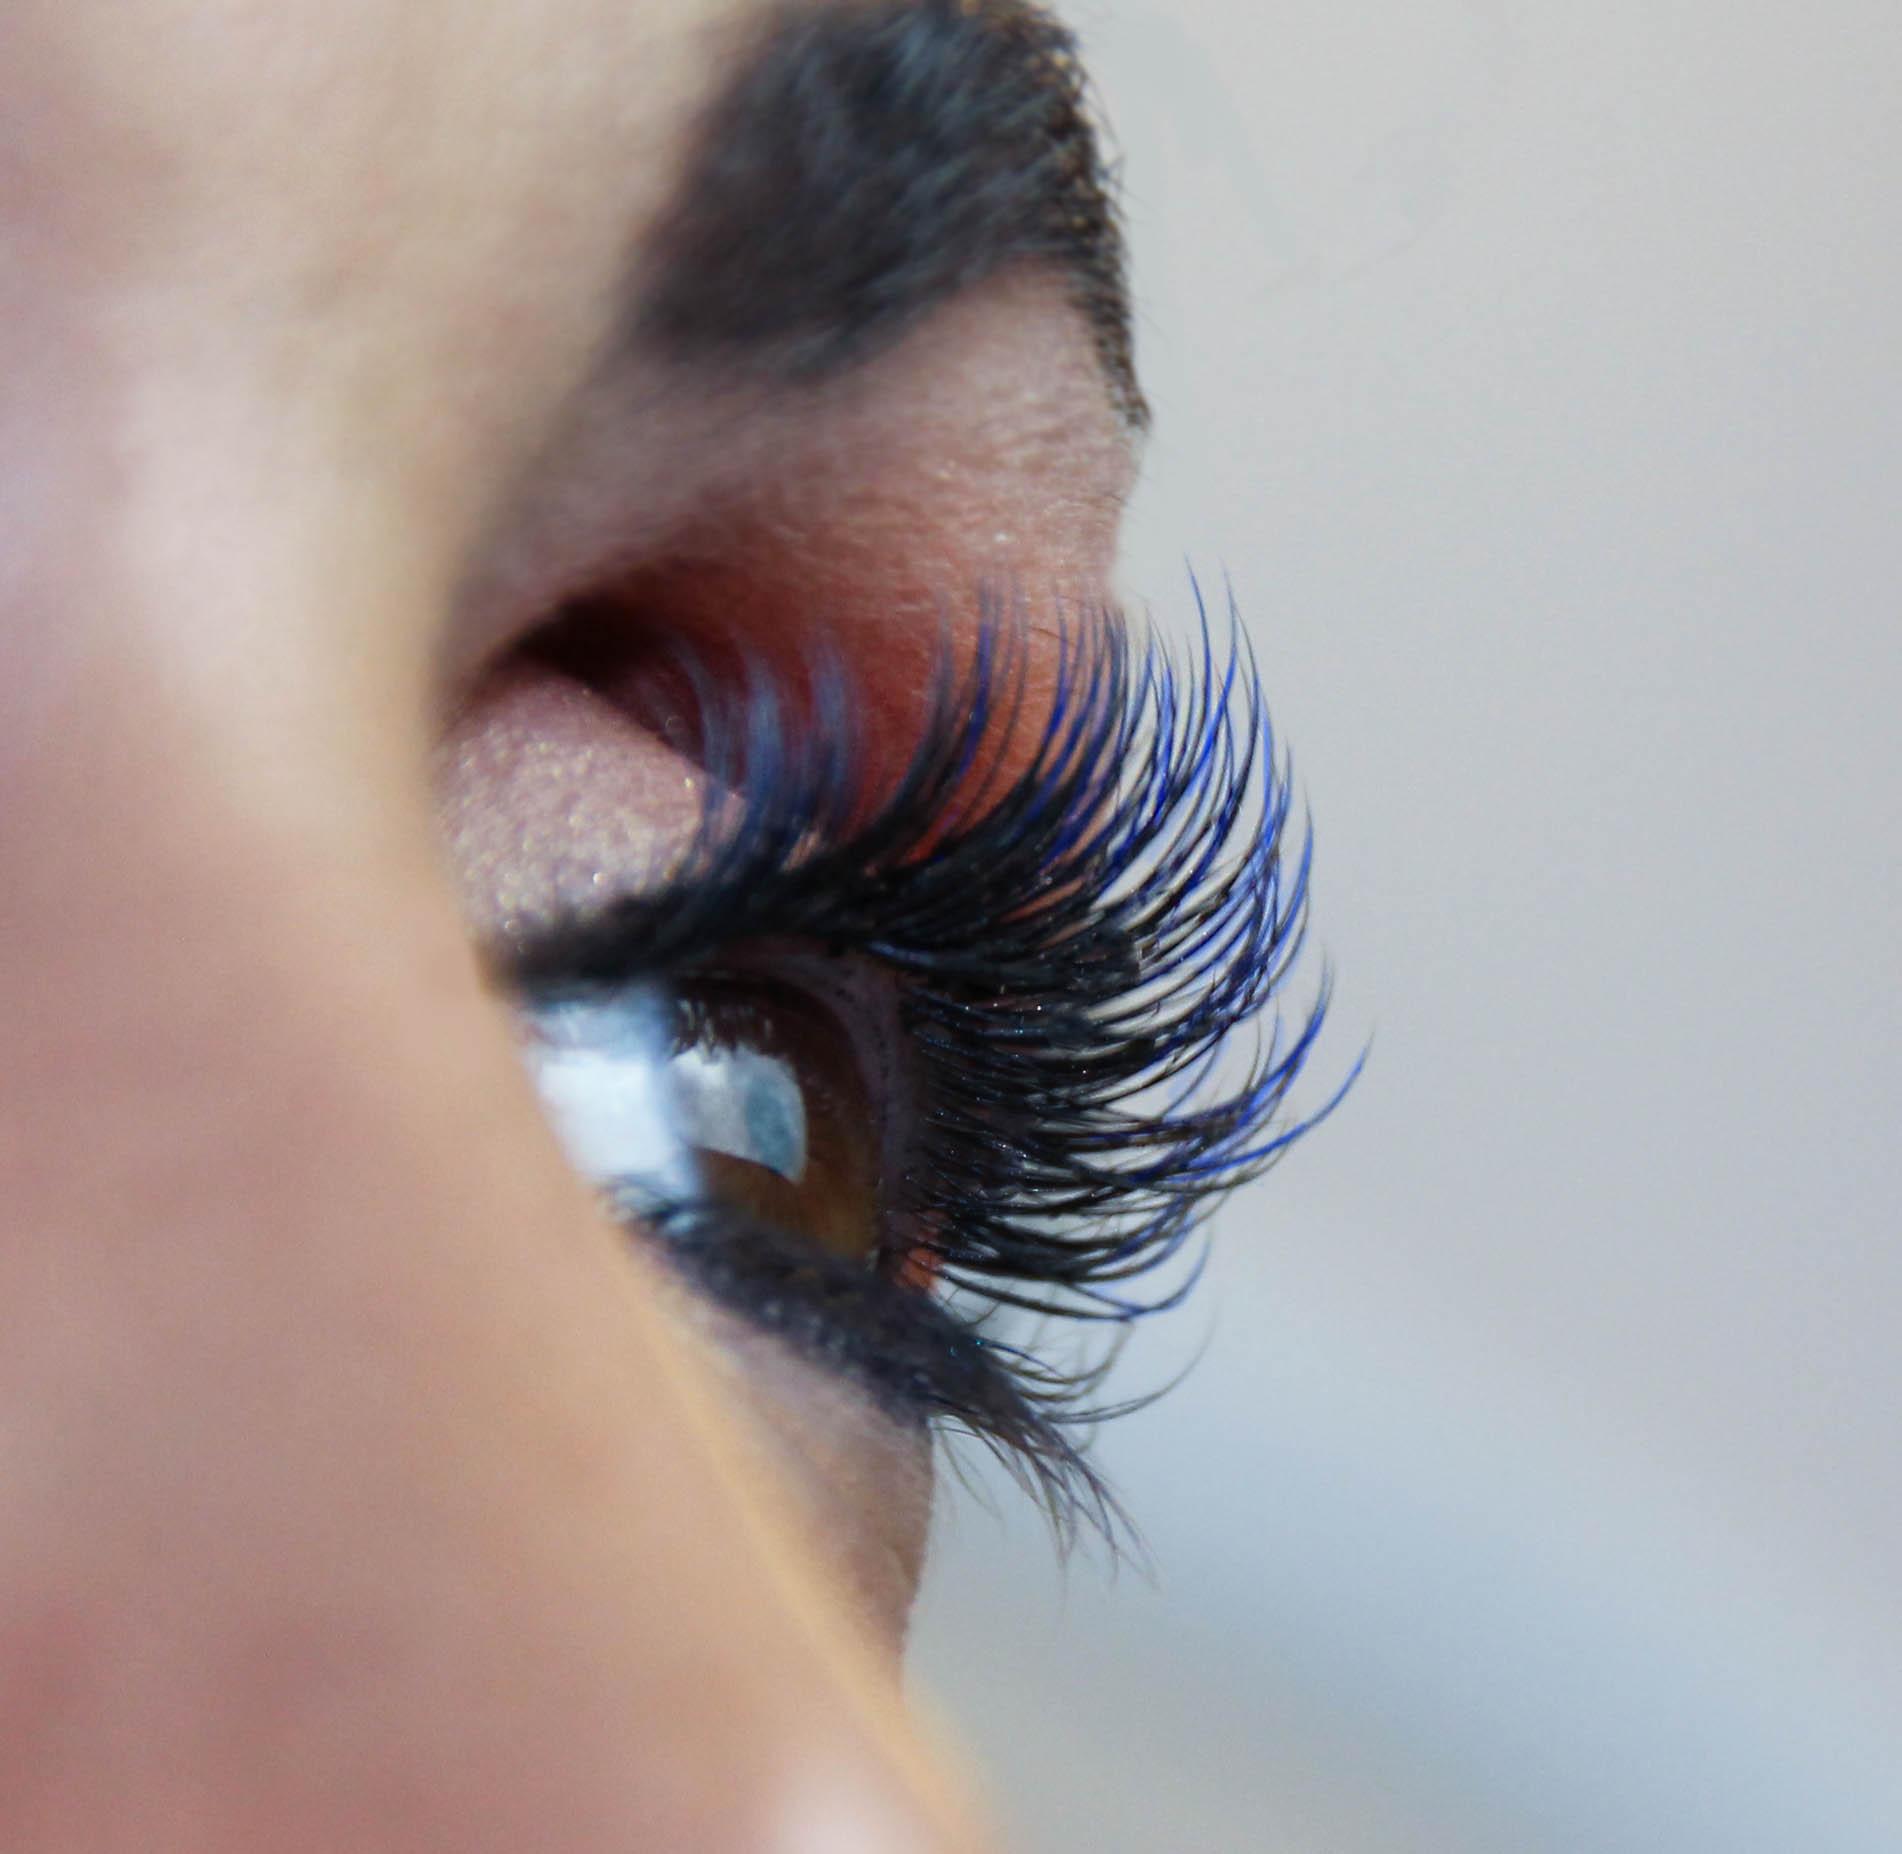 Permalink to Best Natural Eyelashes